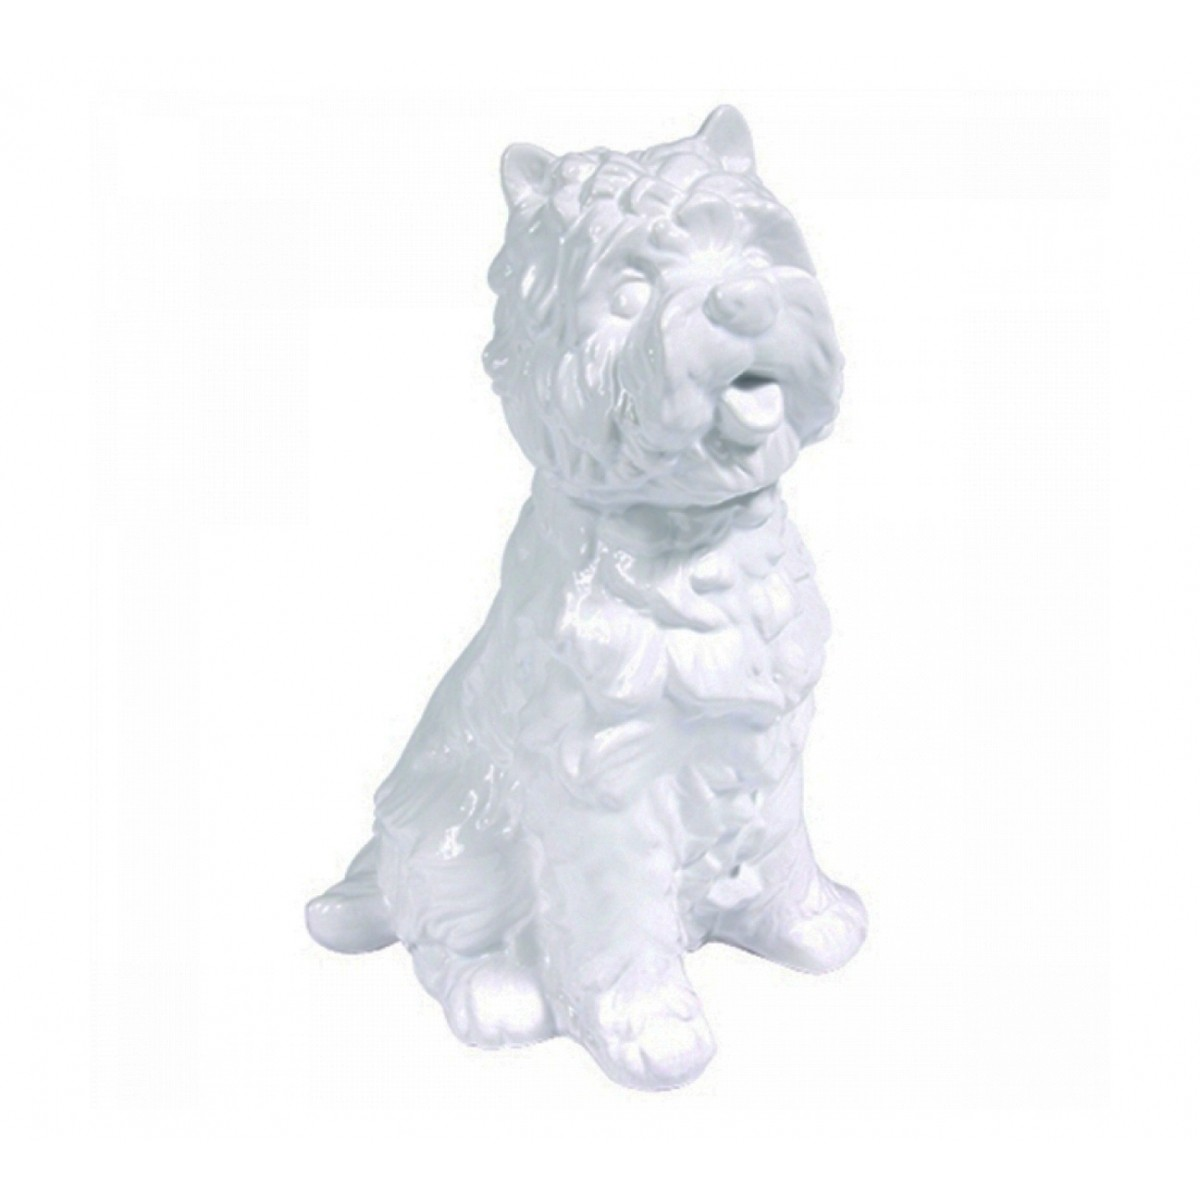 Cachorro Decorativo de Cerâmica - Branco G  - N Store